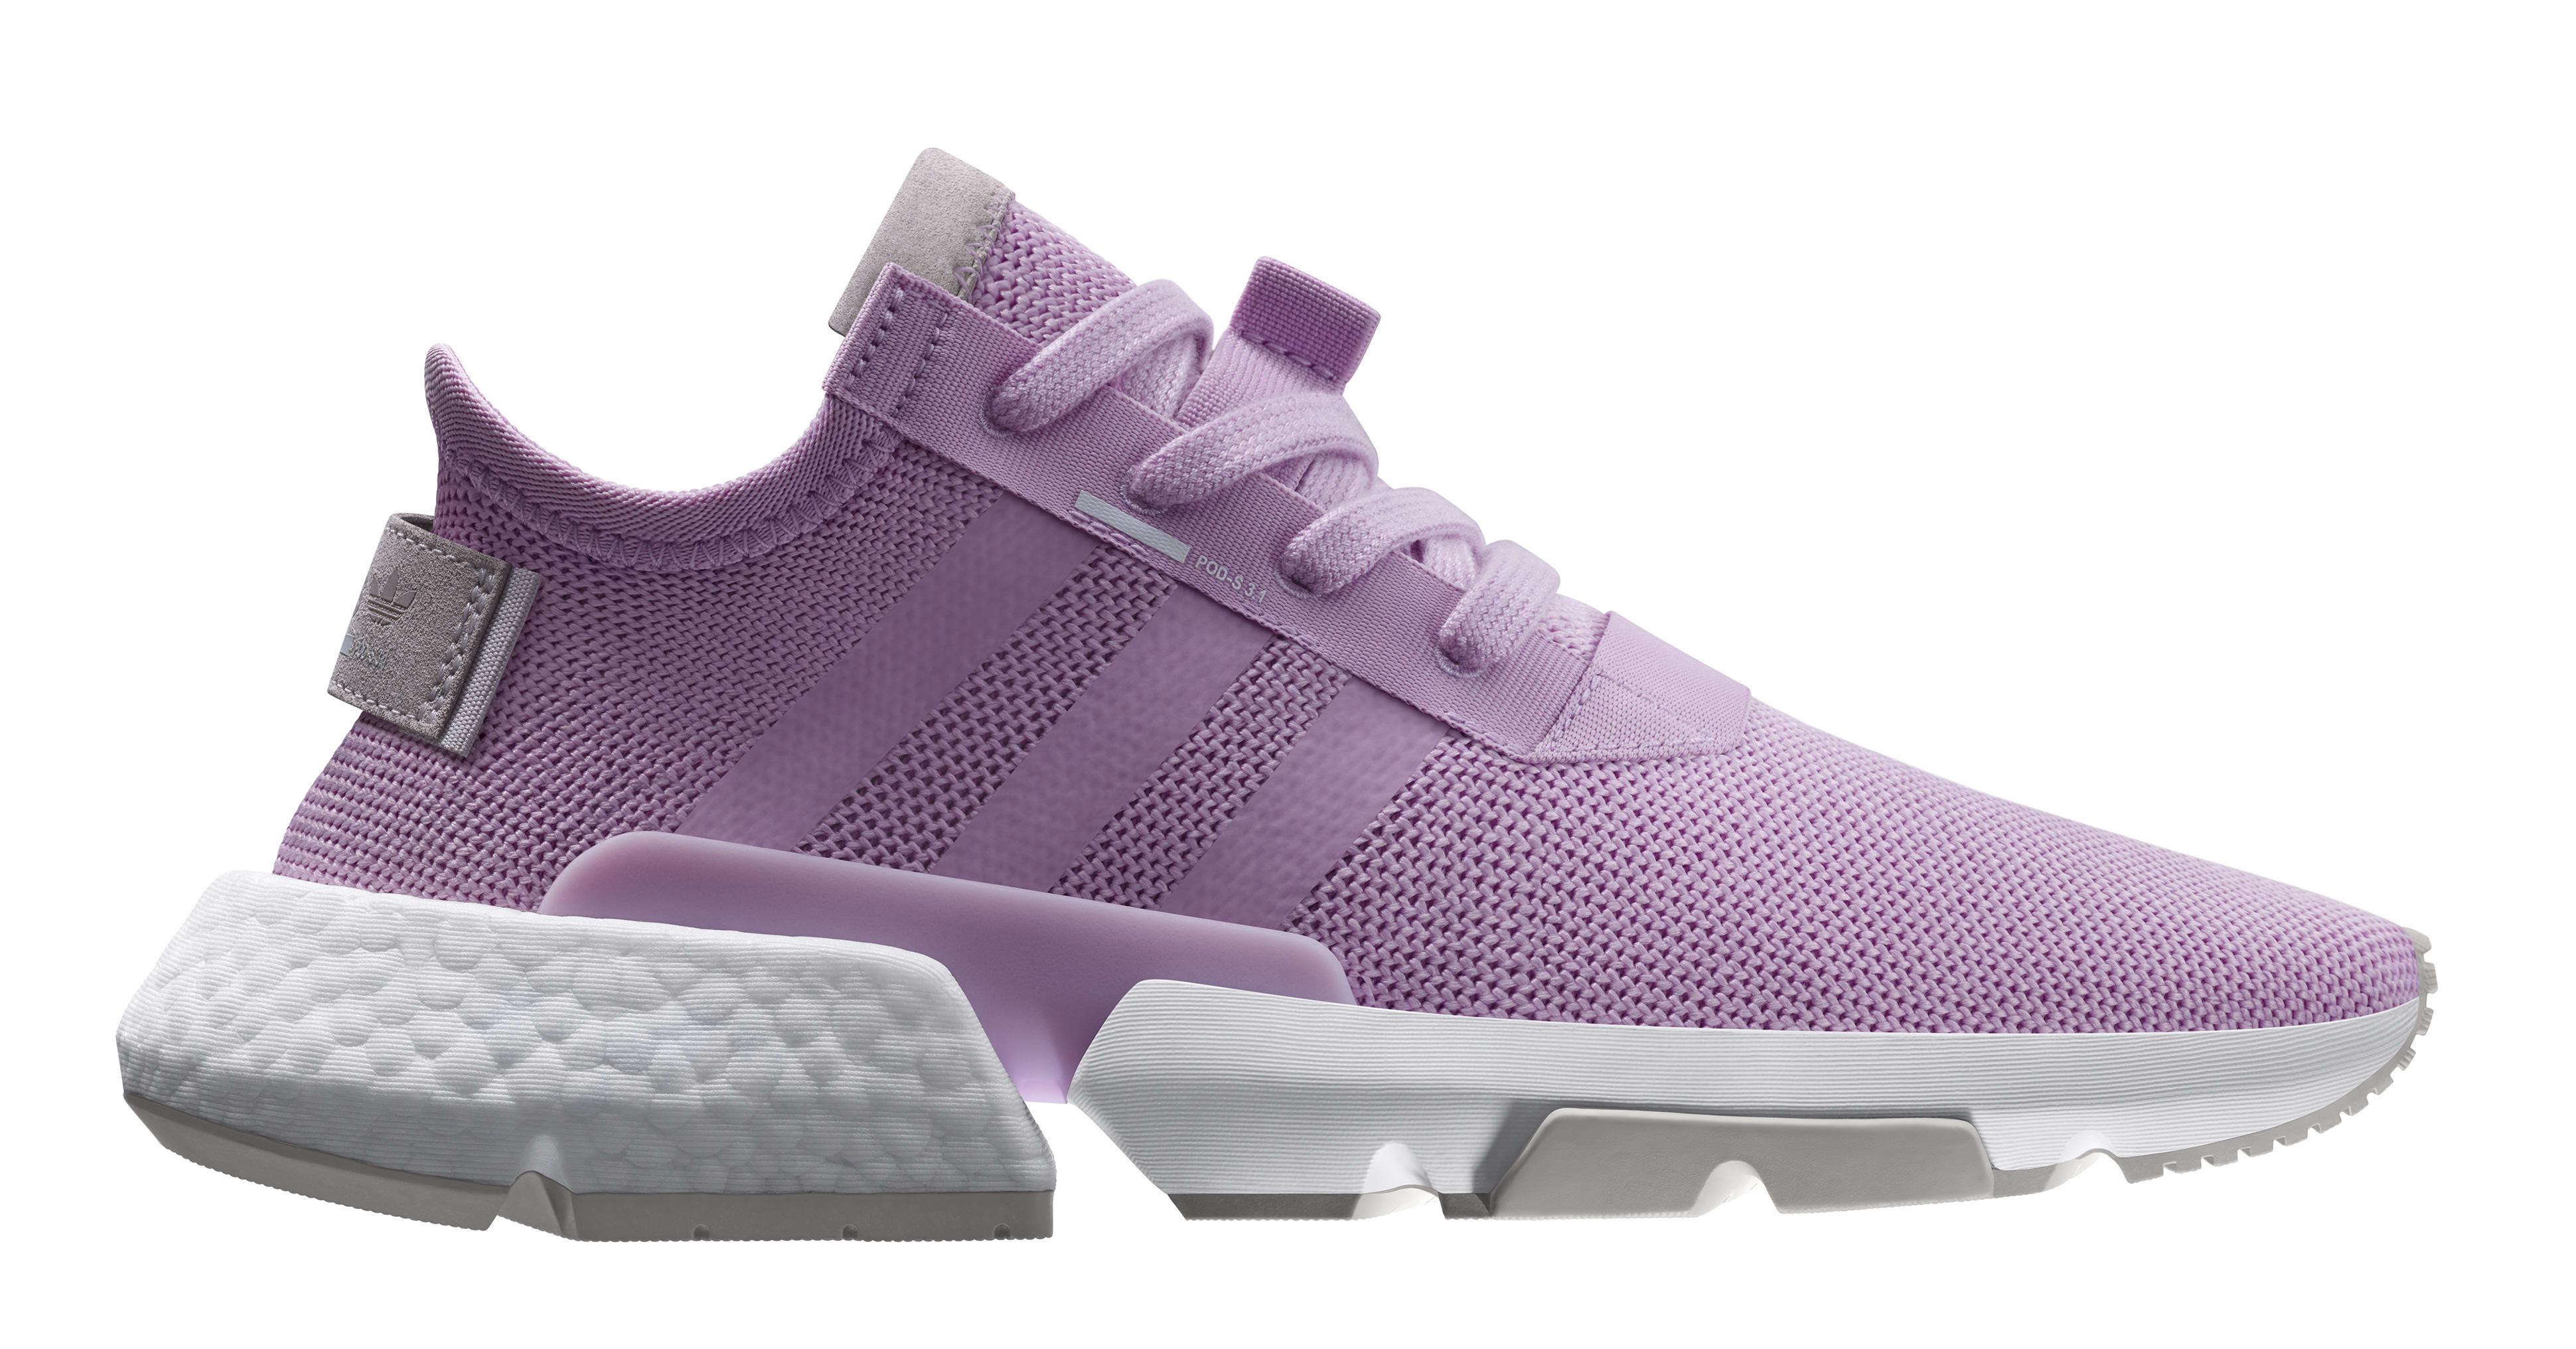 Adidas POD System W 'Lavender' B37469 (Lateral)